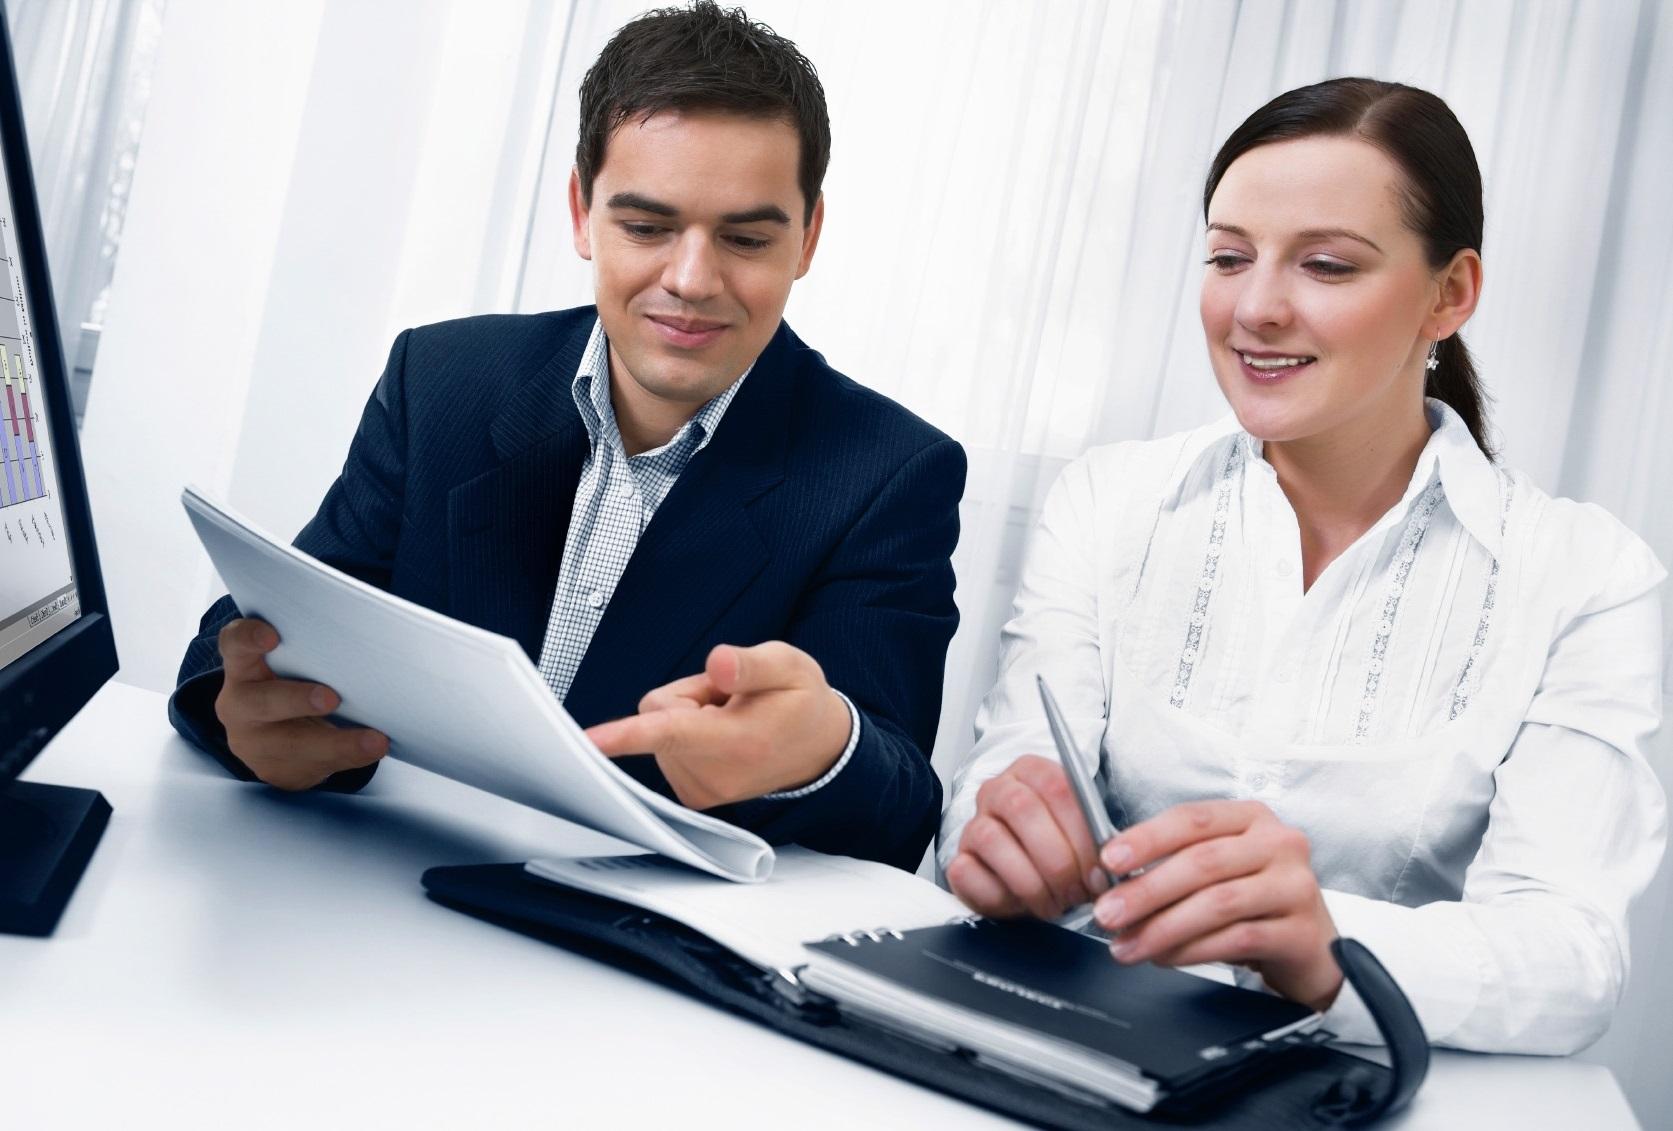 Venta de seguros por internet